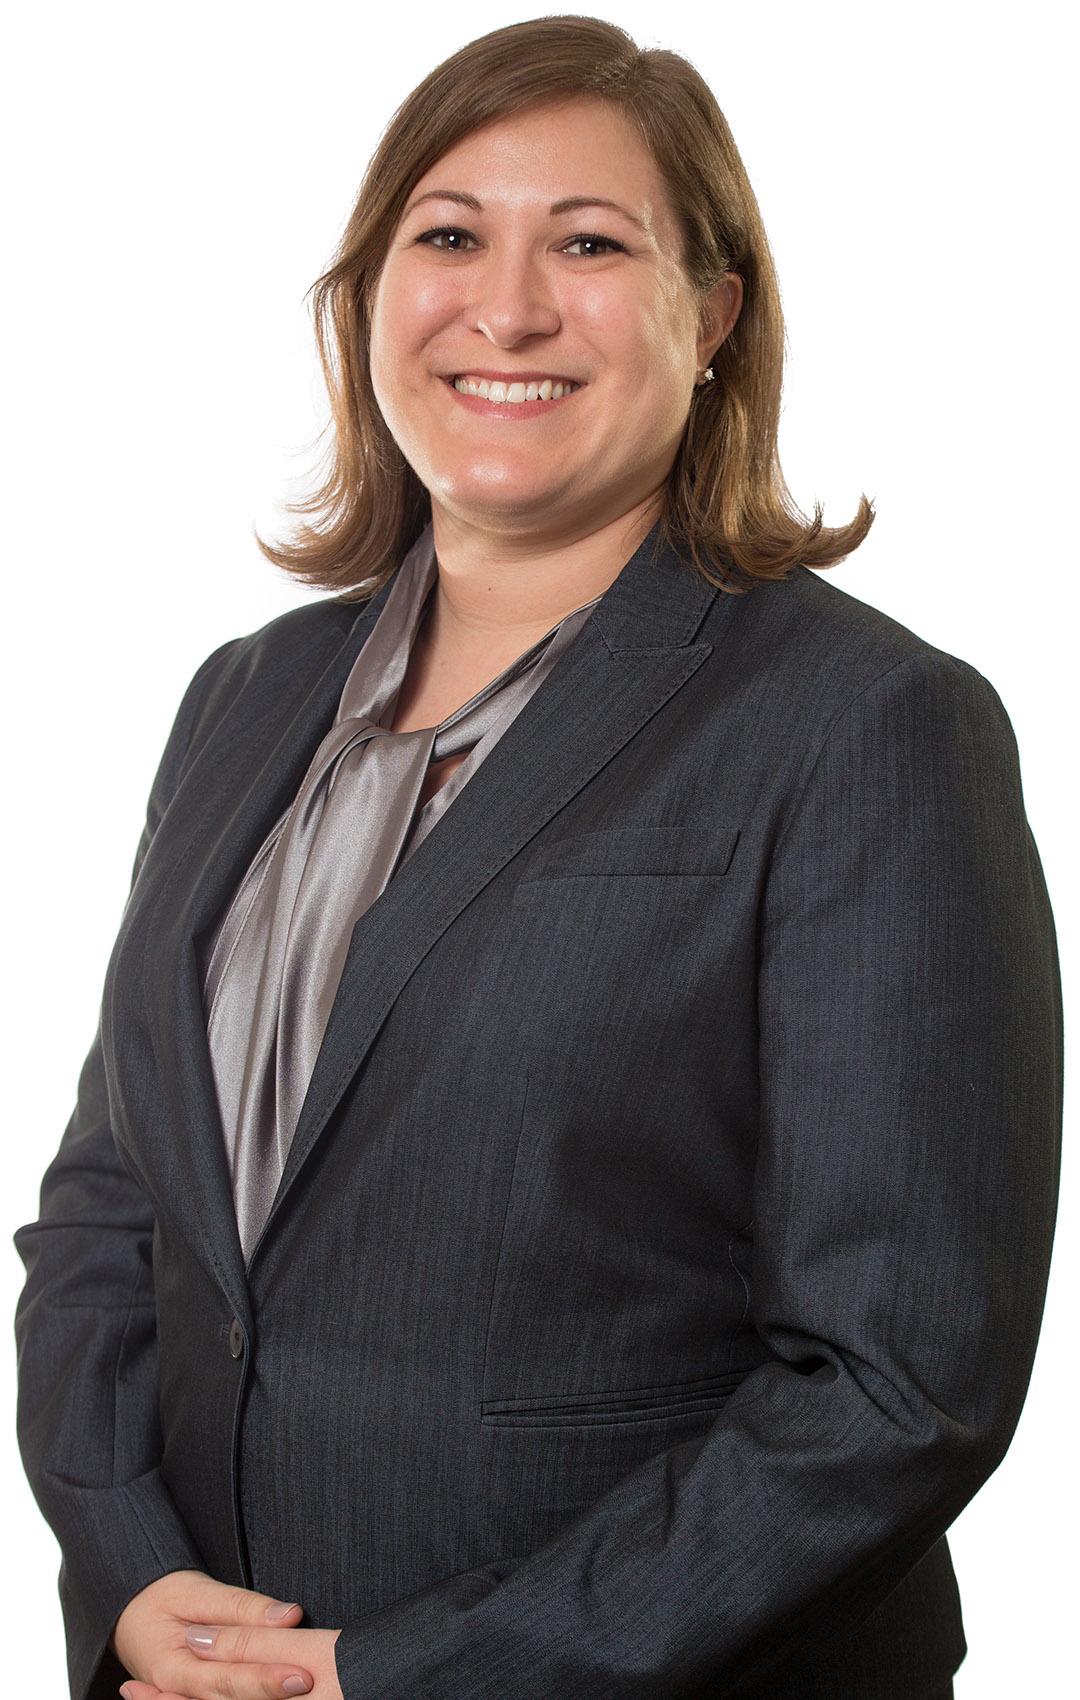 Katherine A. Lawler